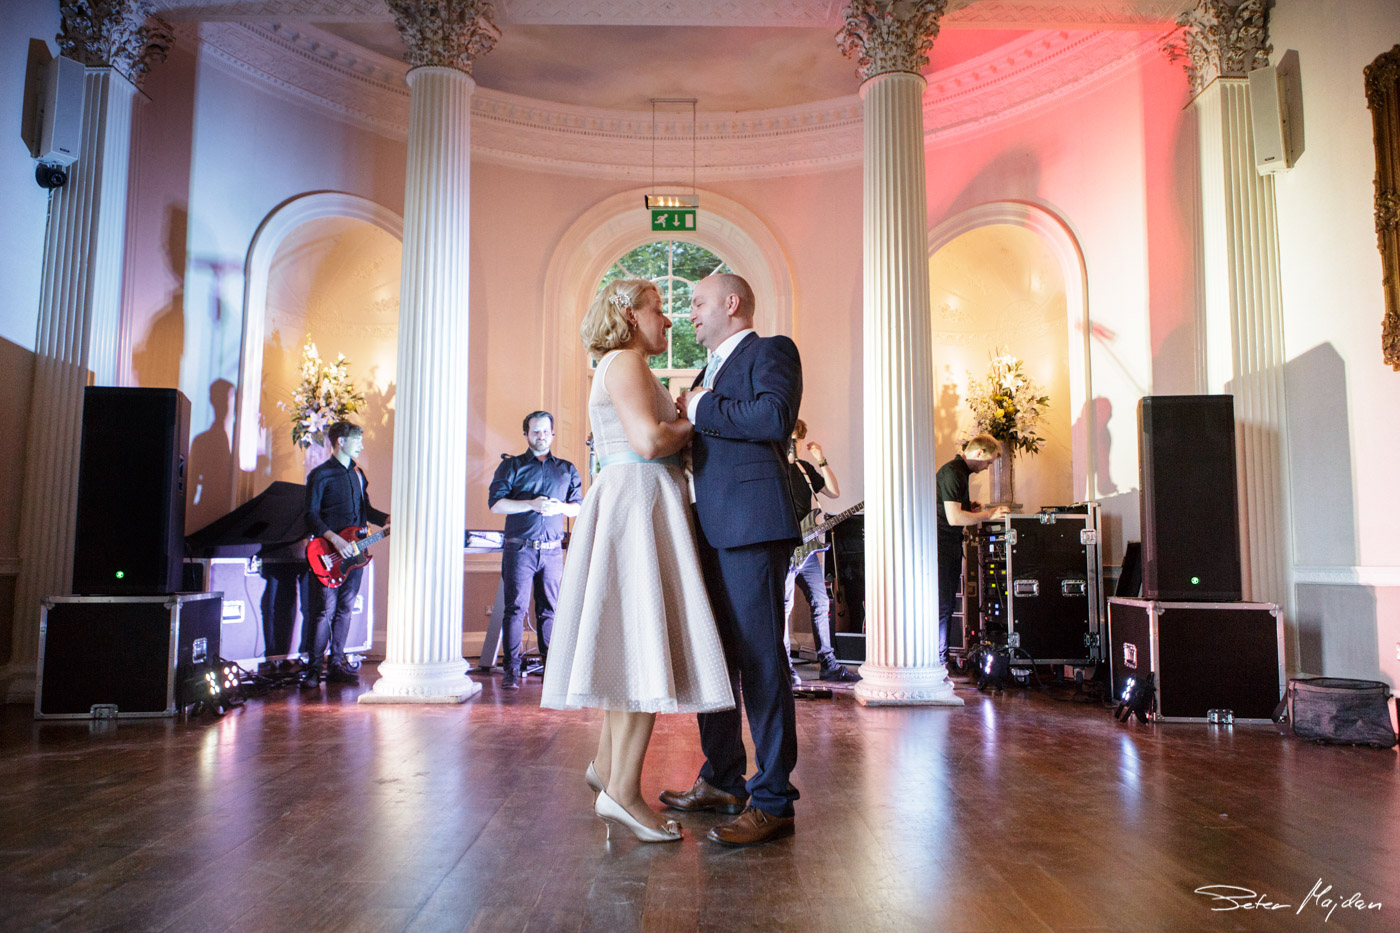 Colwick-hall-wedding-photography-65.jpg